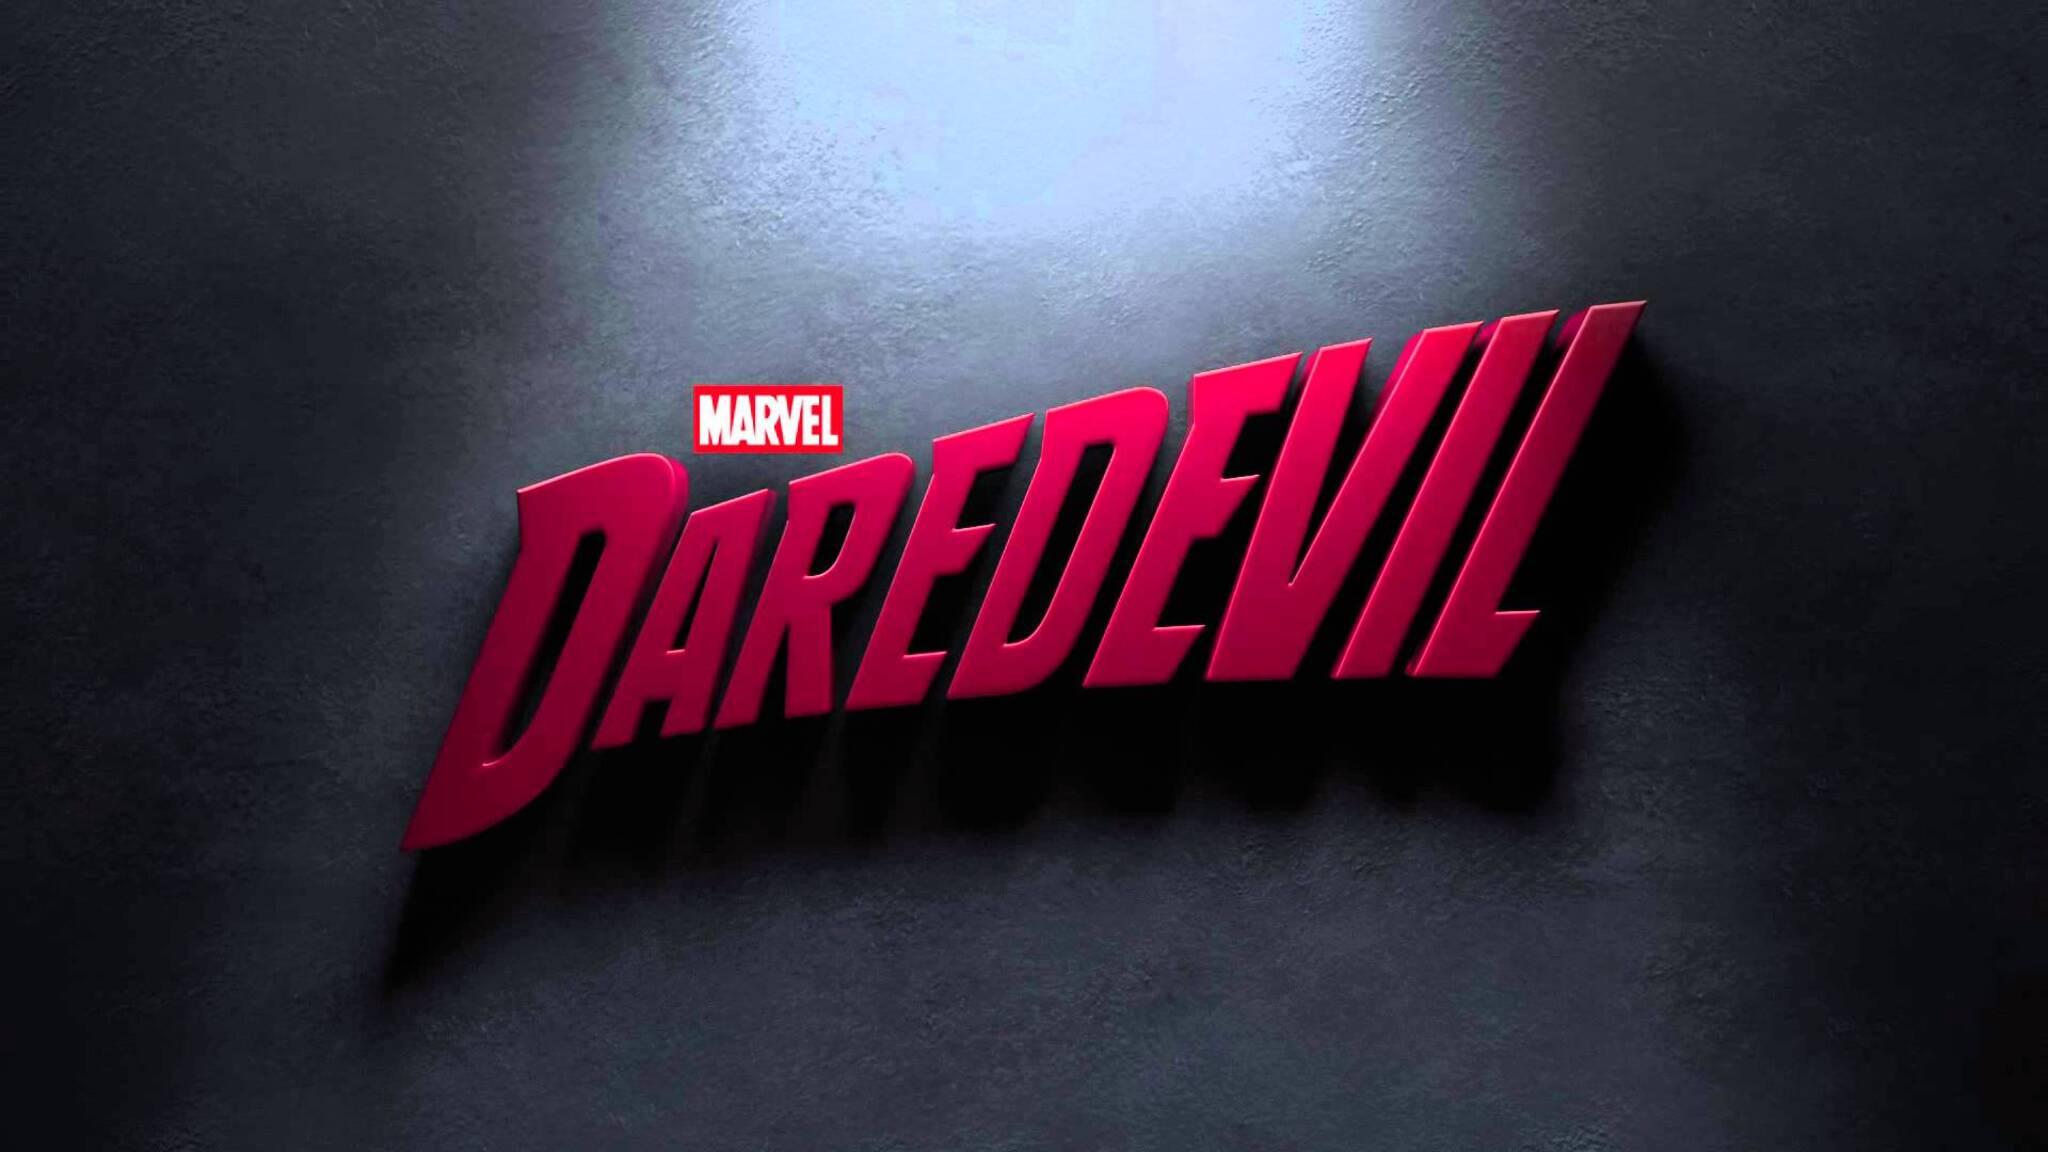 2048x1152 dare devil logo 2048x1152 resolution hd 4k wallpapers dare devil logo 4kg voltagebd Gallery